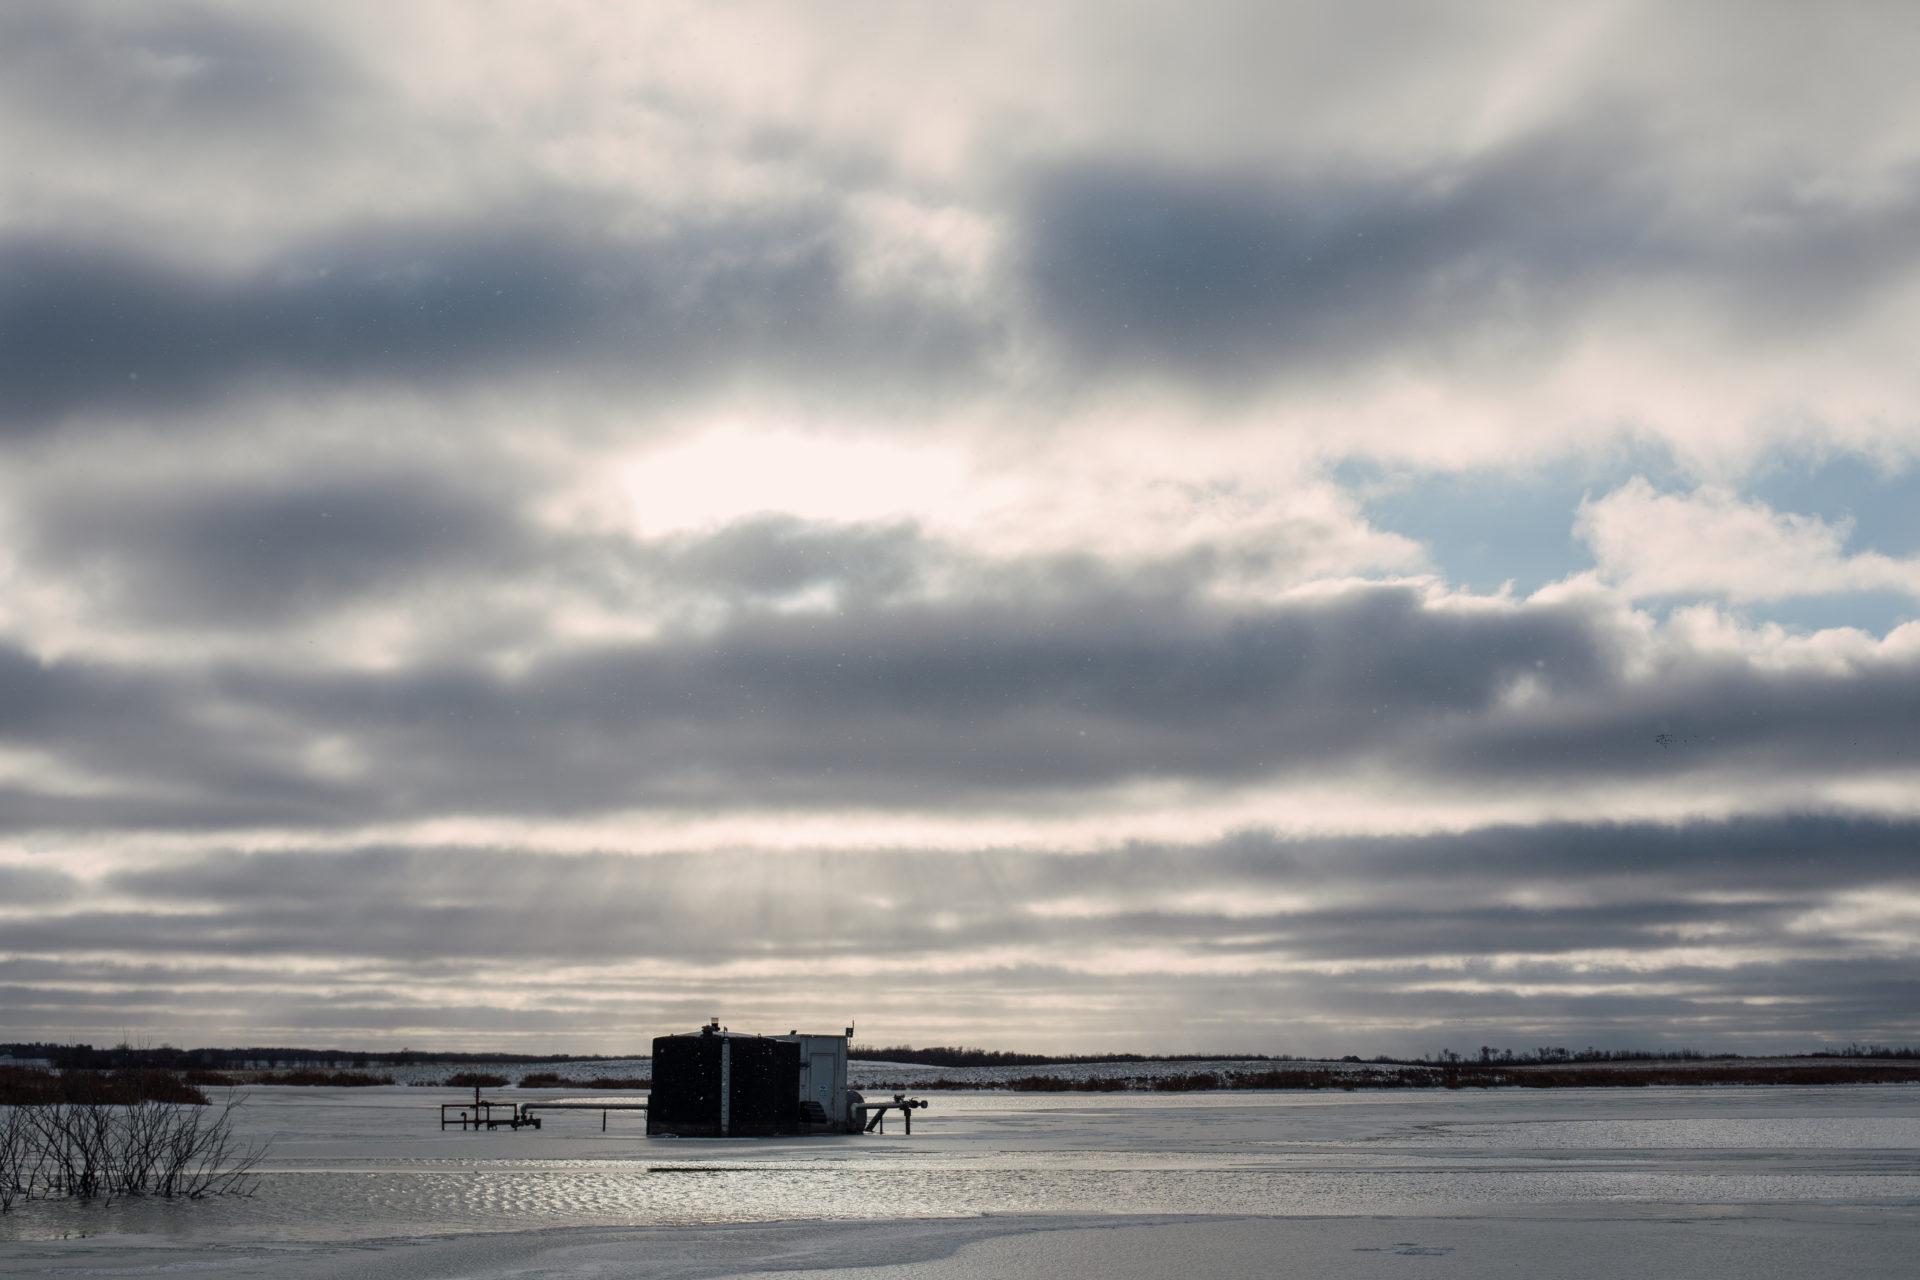 Oil lease site in Wetaskiwin, Alberta on Monday, November 5, 2018. Amber Bracken